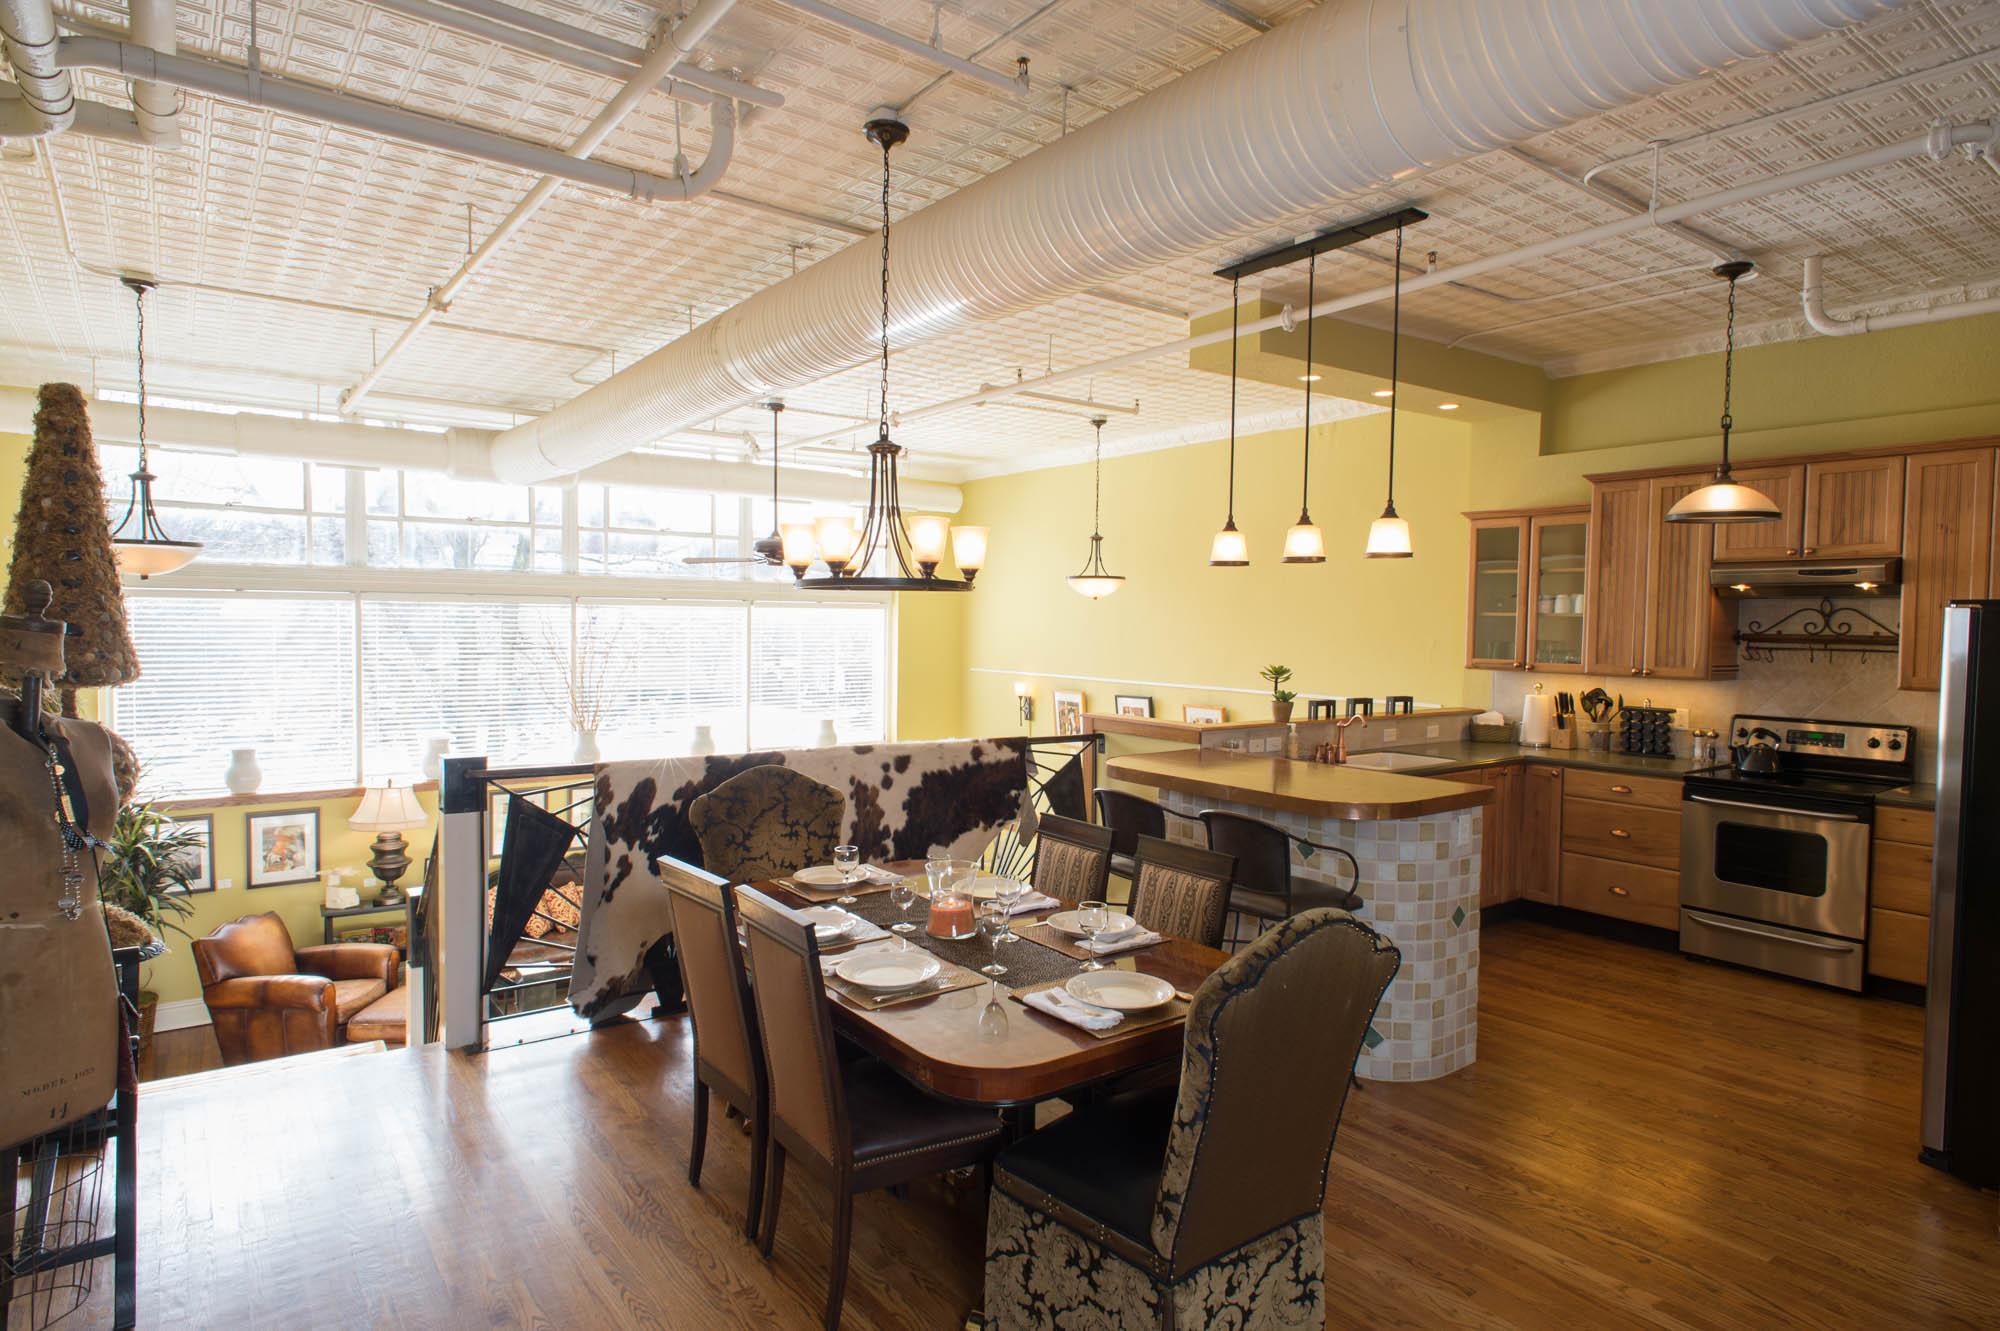 Dining Room/Kitchen Overlooking Living Room